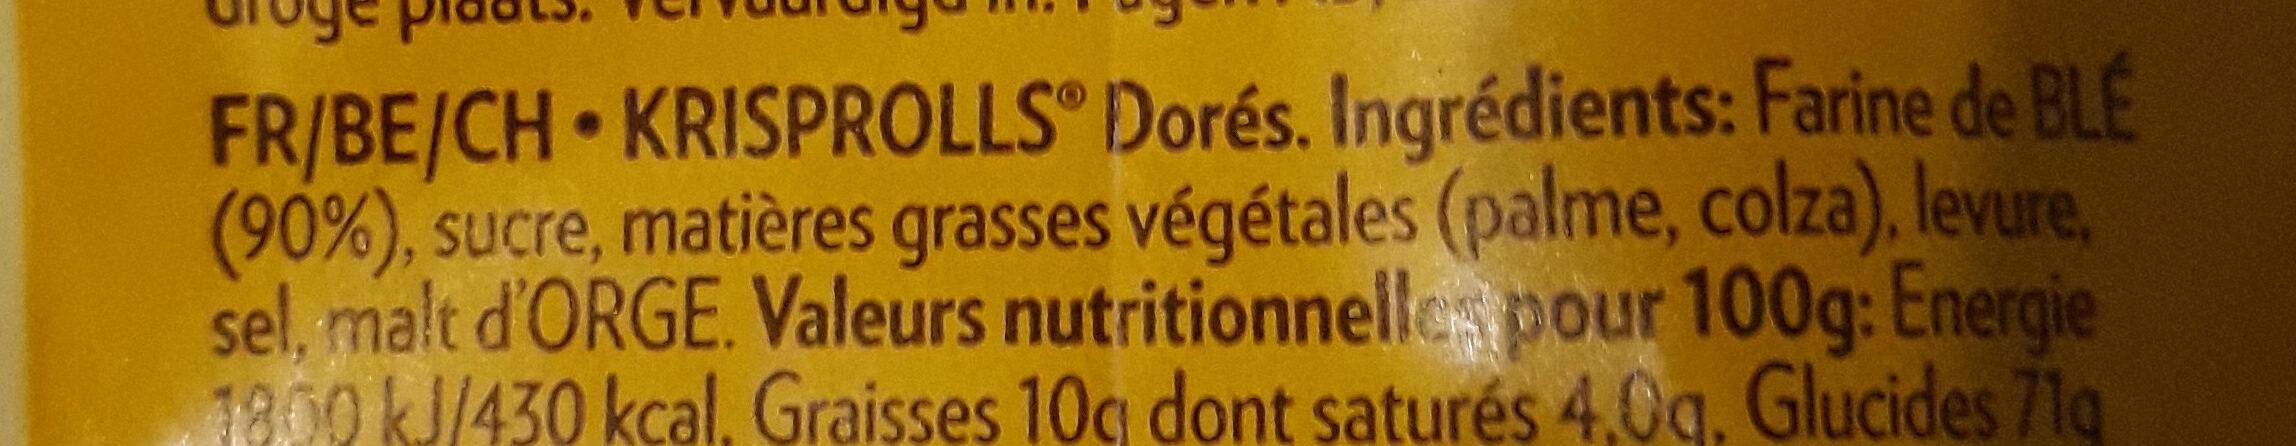 Krisprolls dorés - Ingrediënten - fr